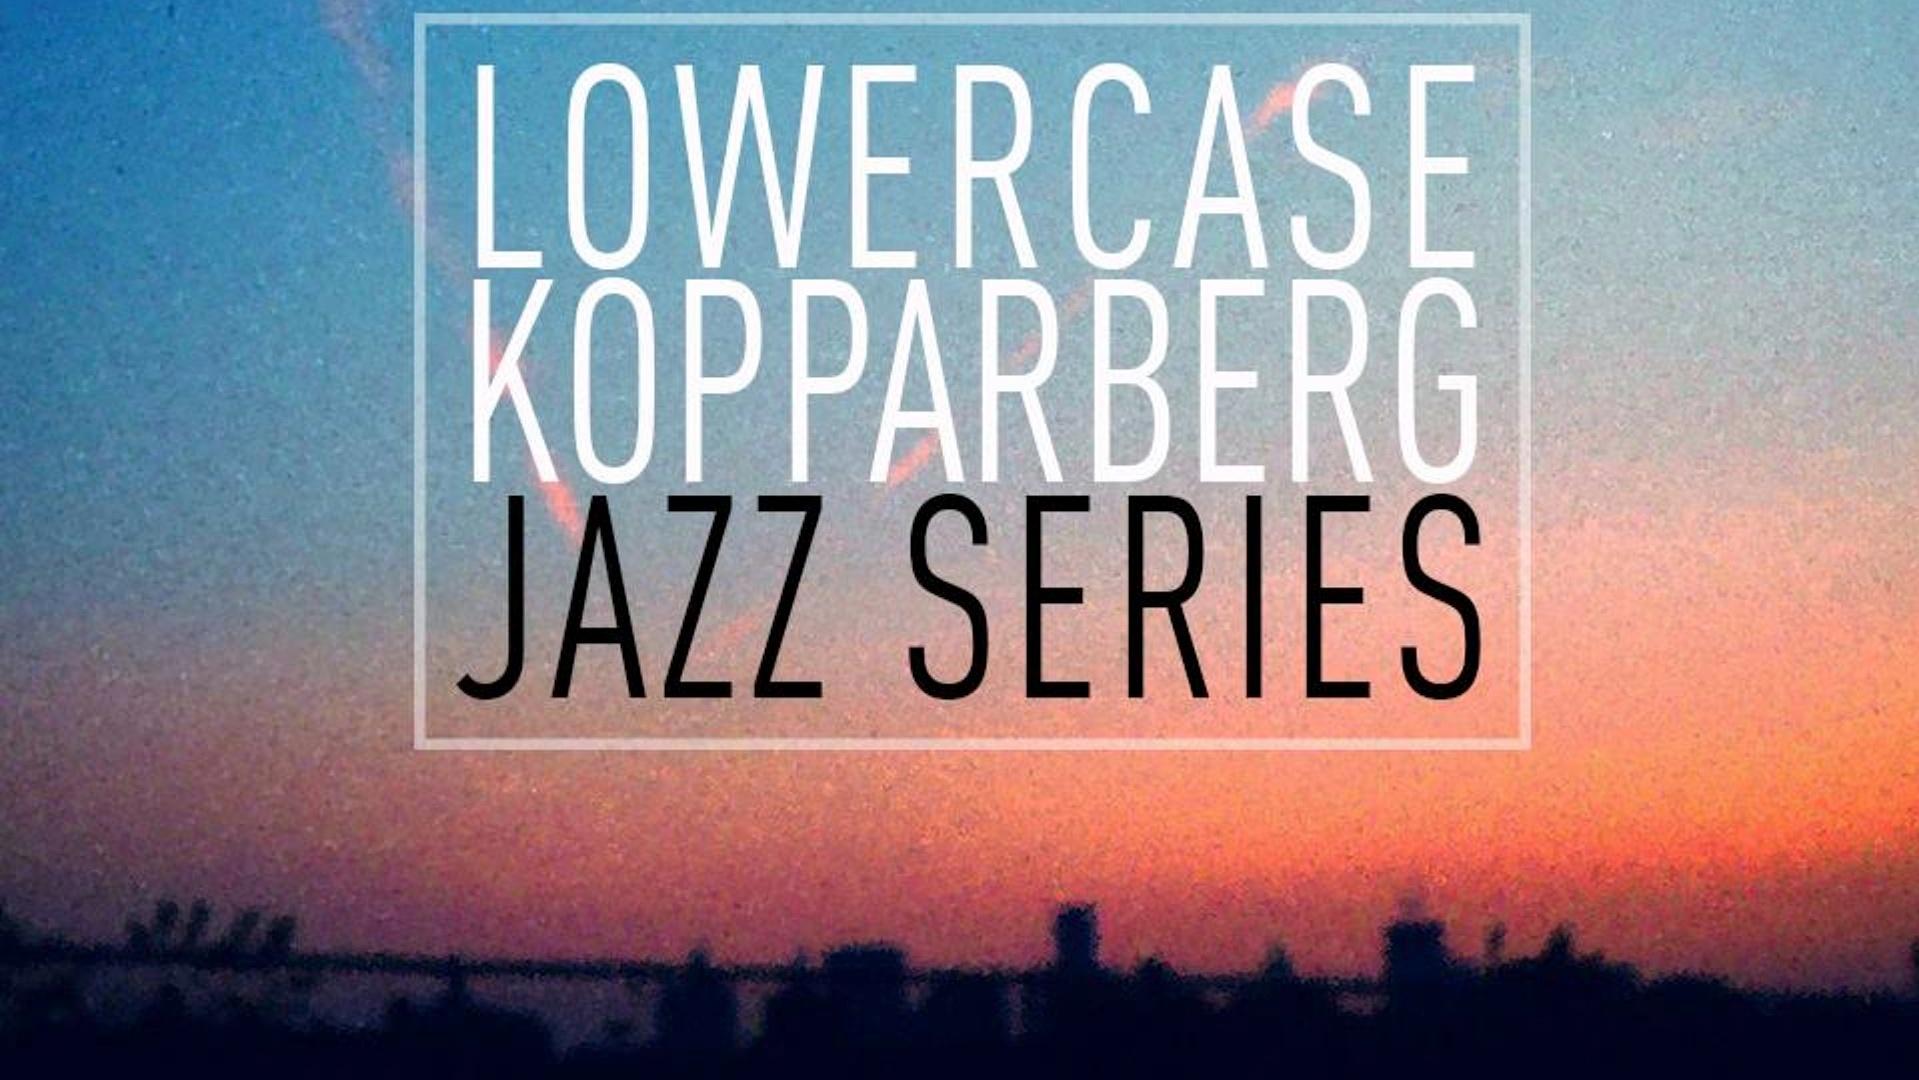 Lowercase Koppaberg Jazz Series #6